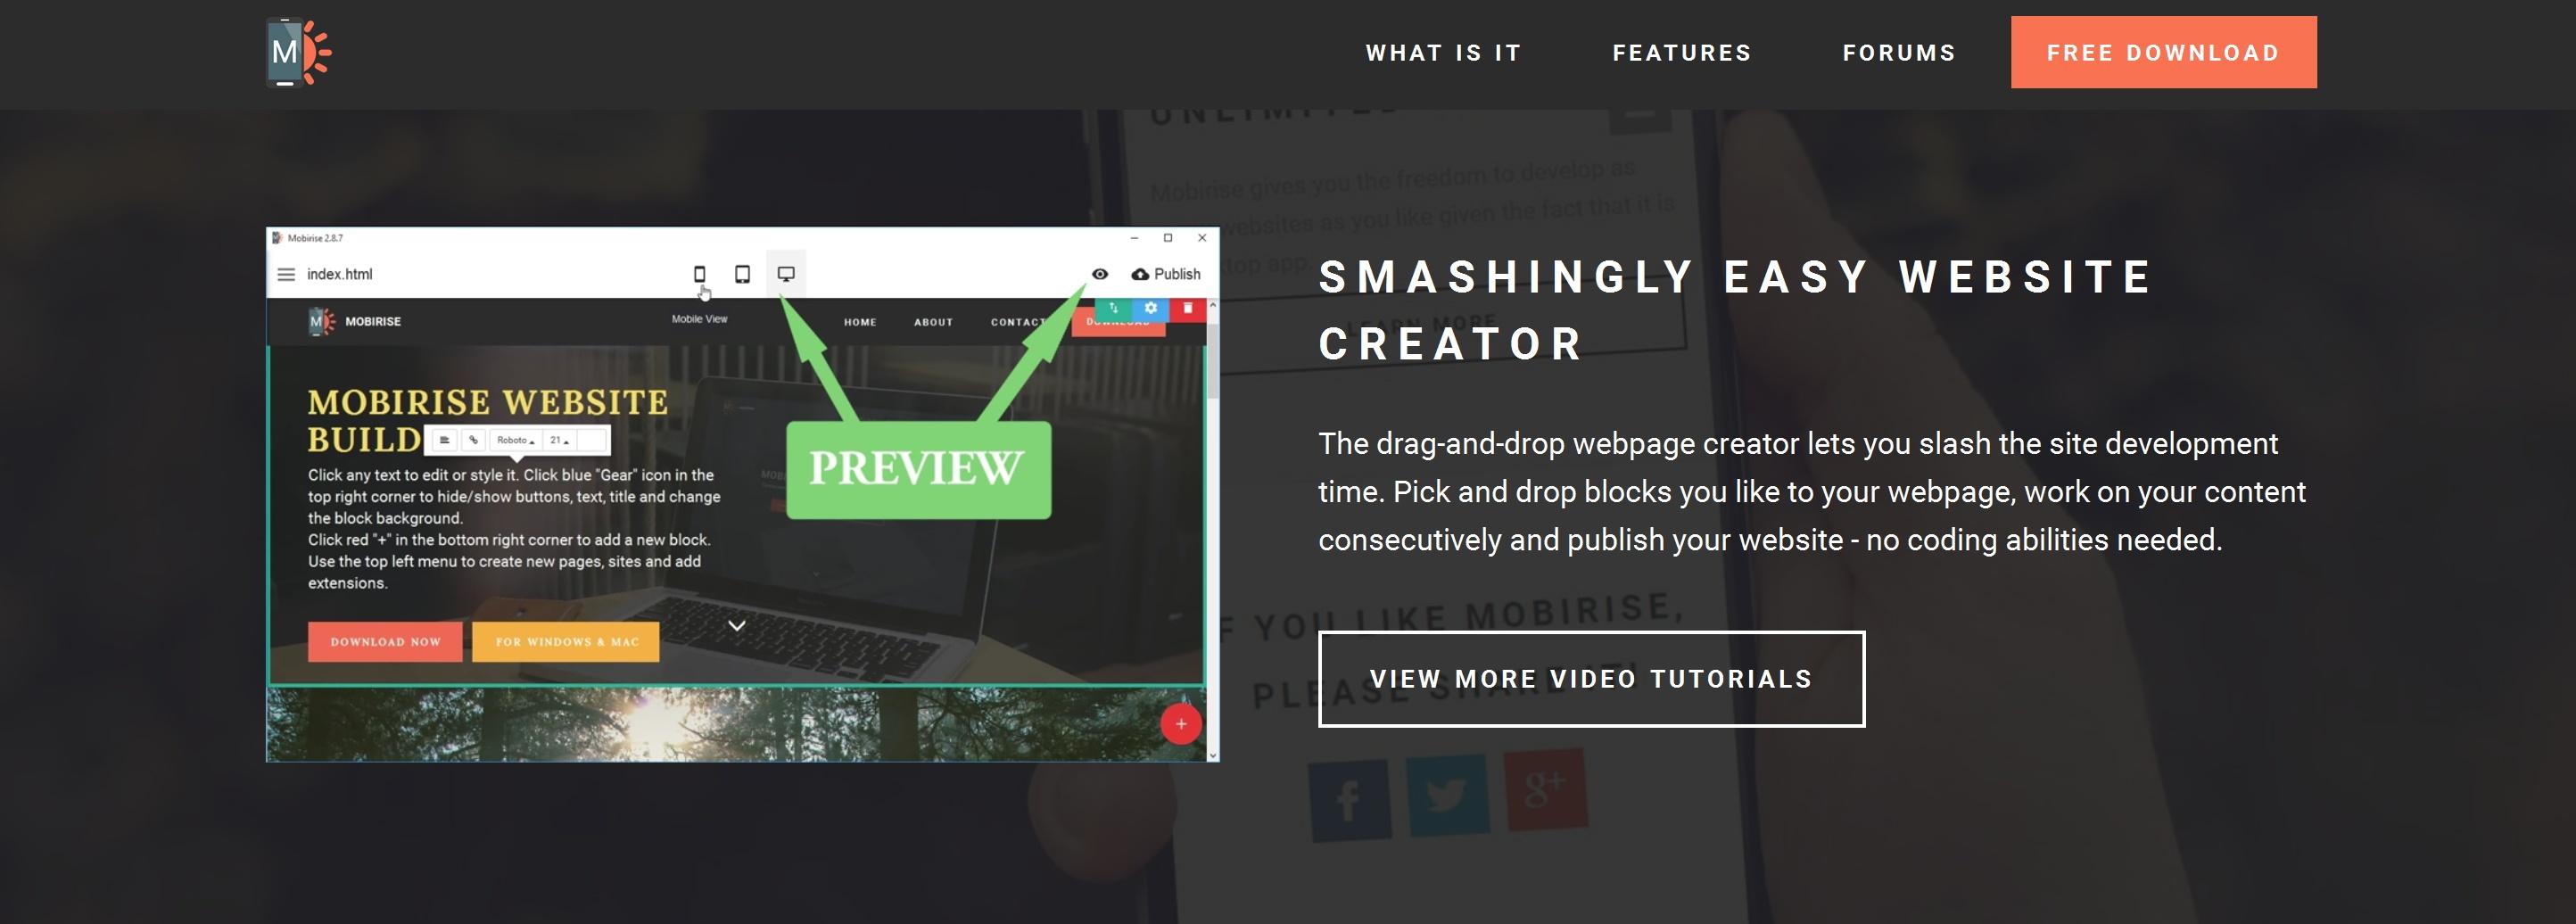 Mobile Simple Website Creator Software